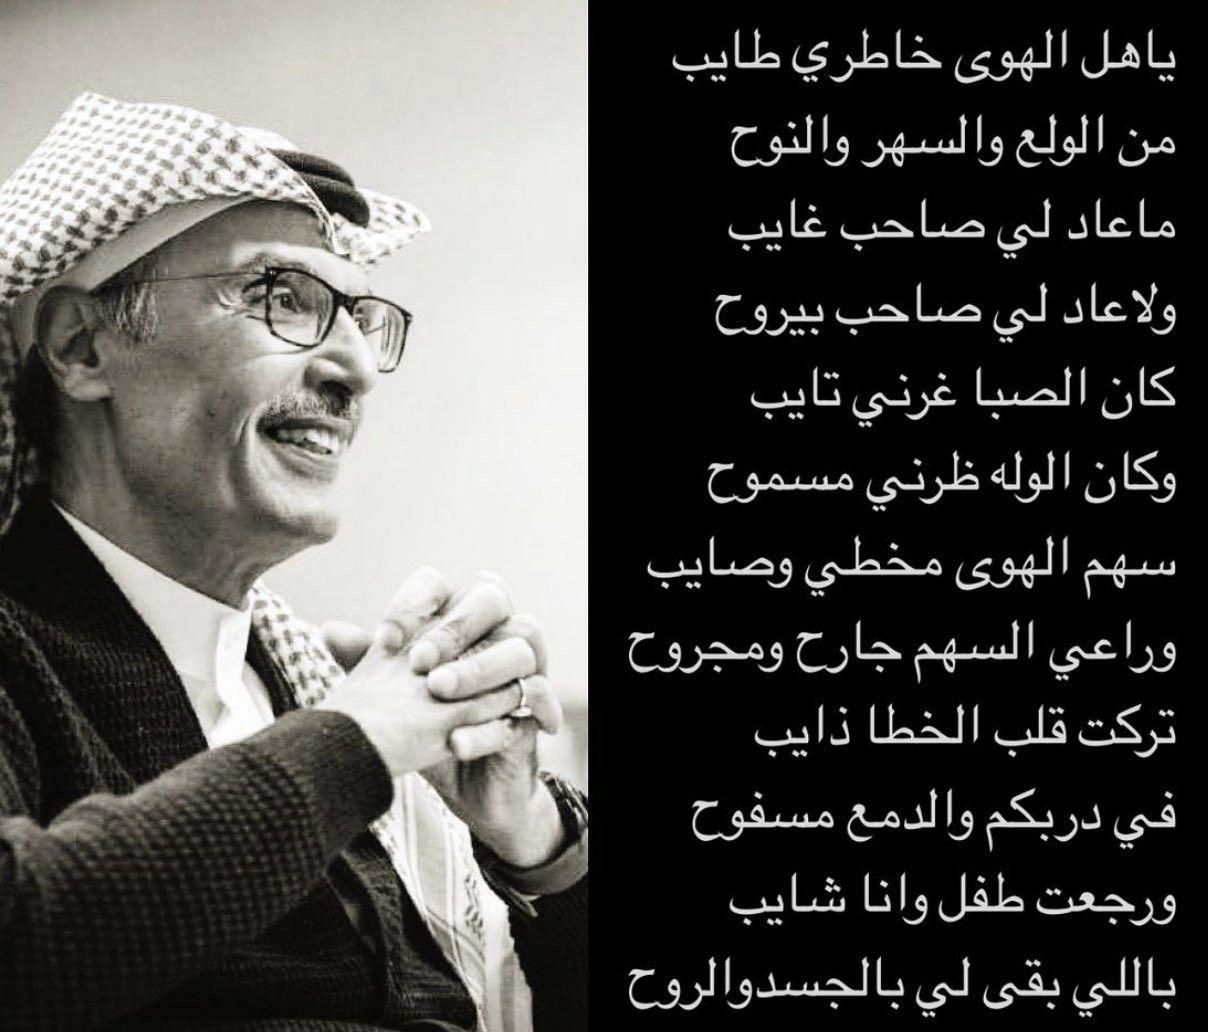 Pin By Najd On خواطر وشعر